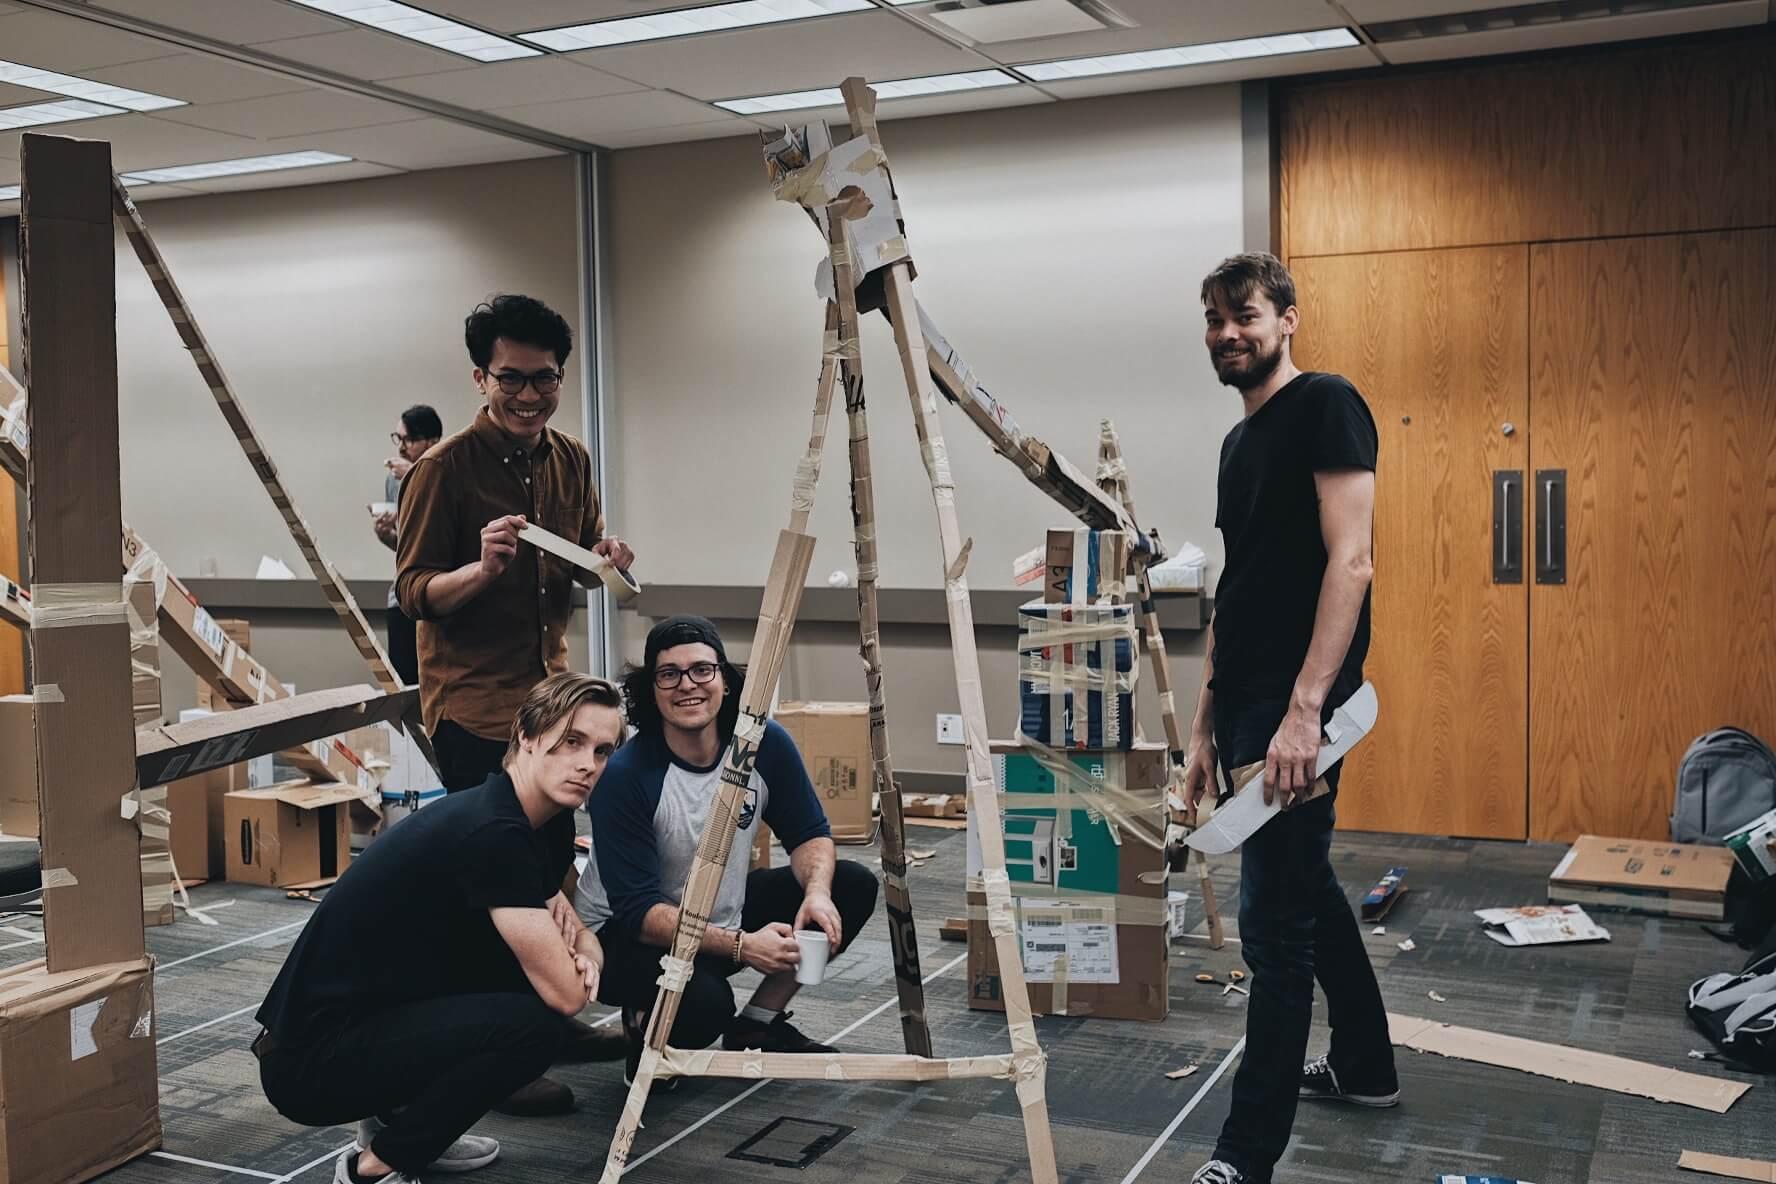 MetaLab's engineering team making marble runs at Remote Summit 18